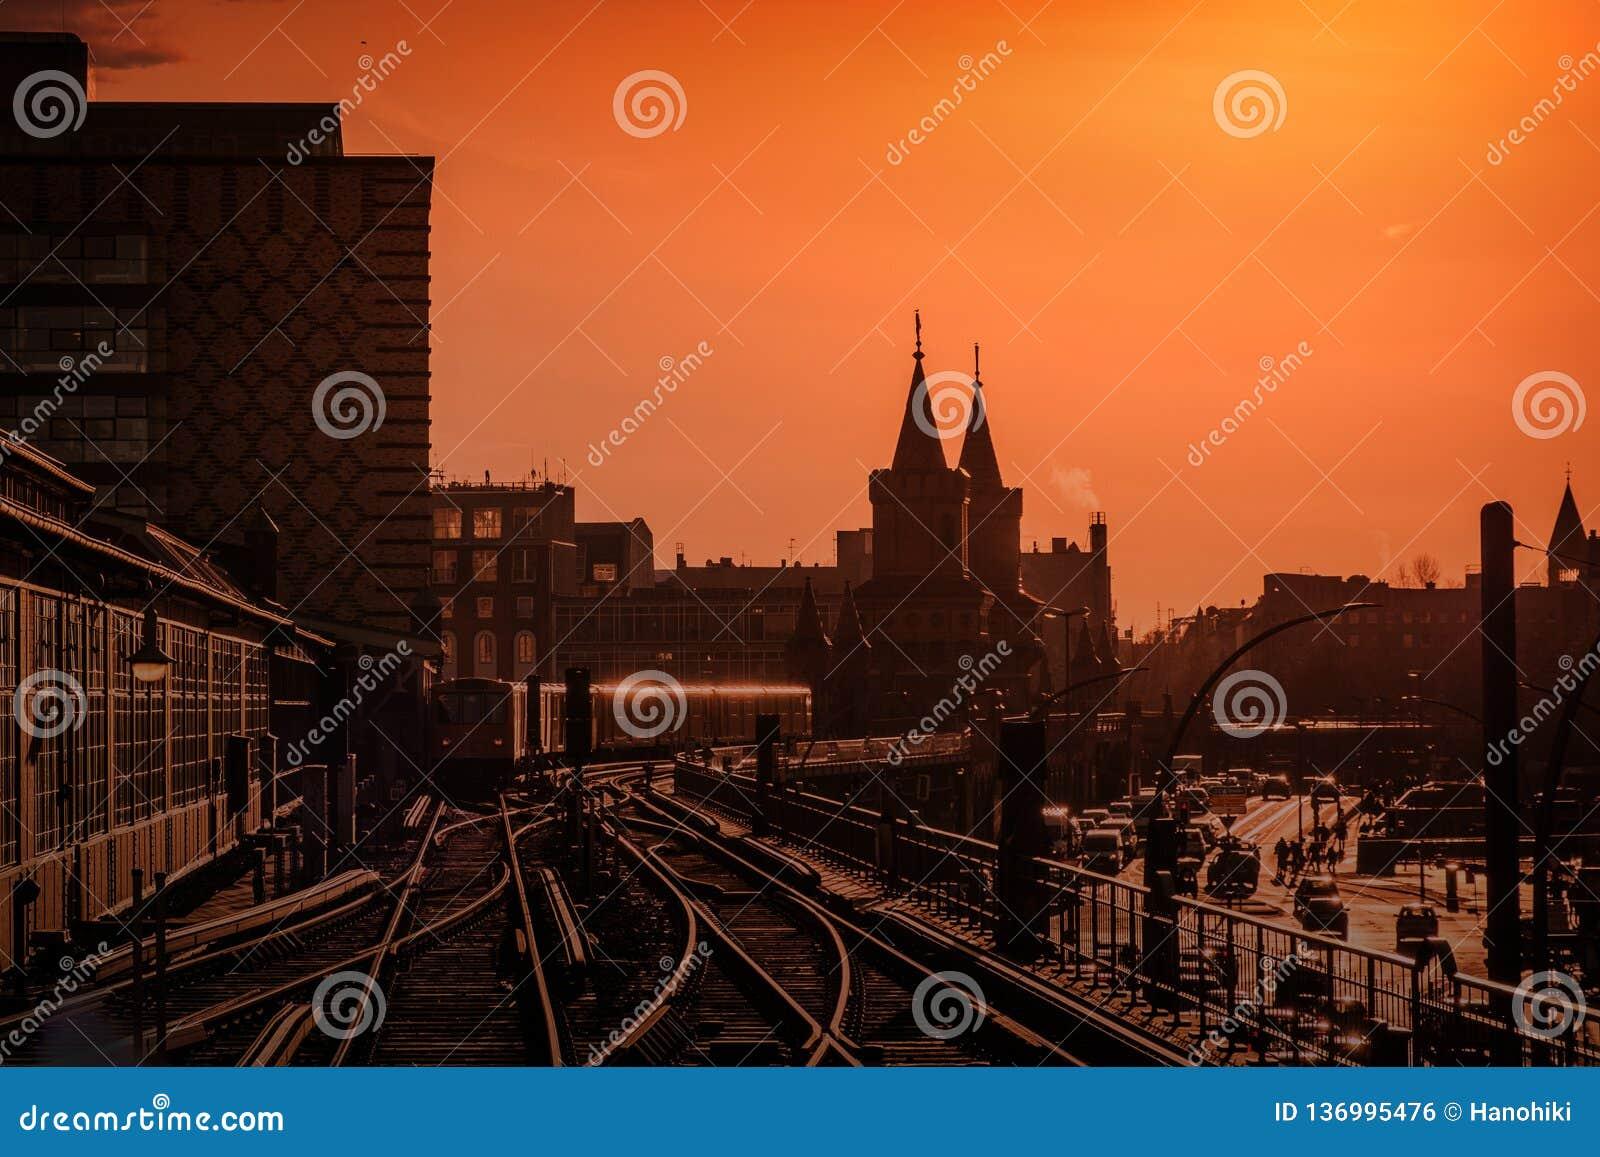 Berlin Cityscape during sunset with train over Oberbaum Bridge between Kreuzberg and Friedrichshain